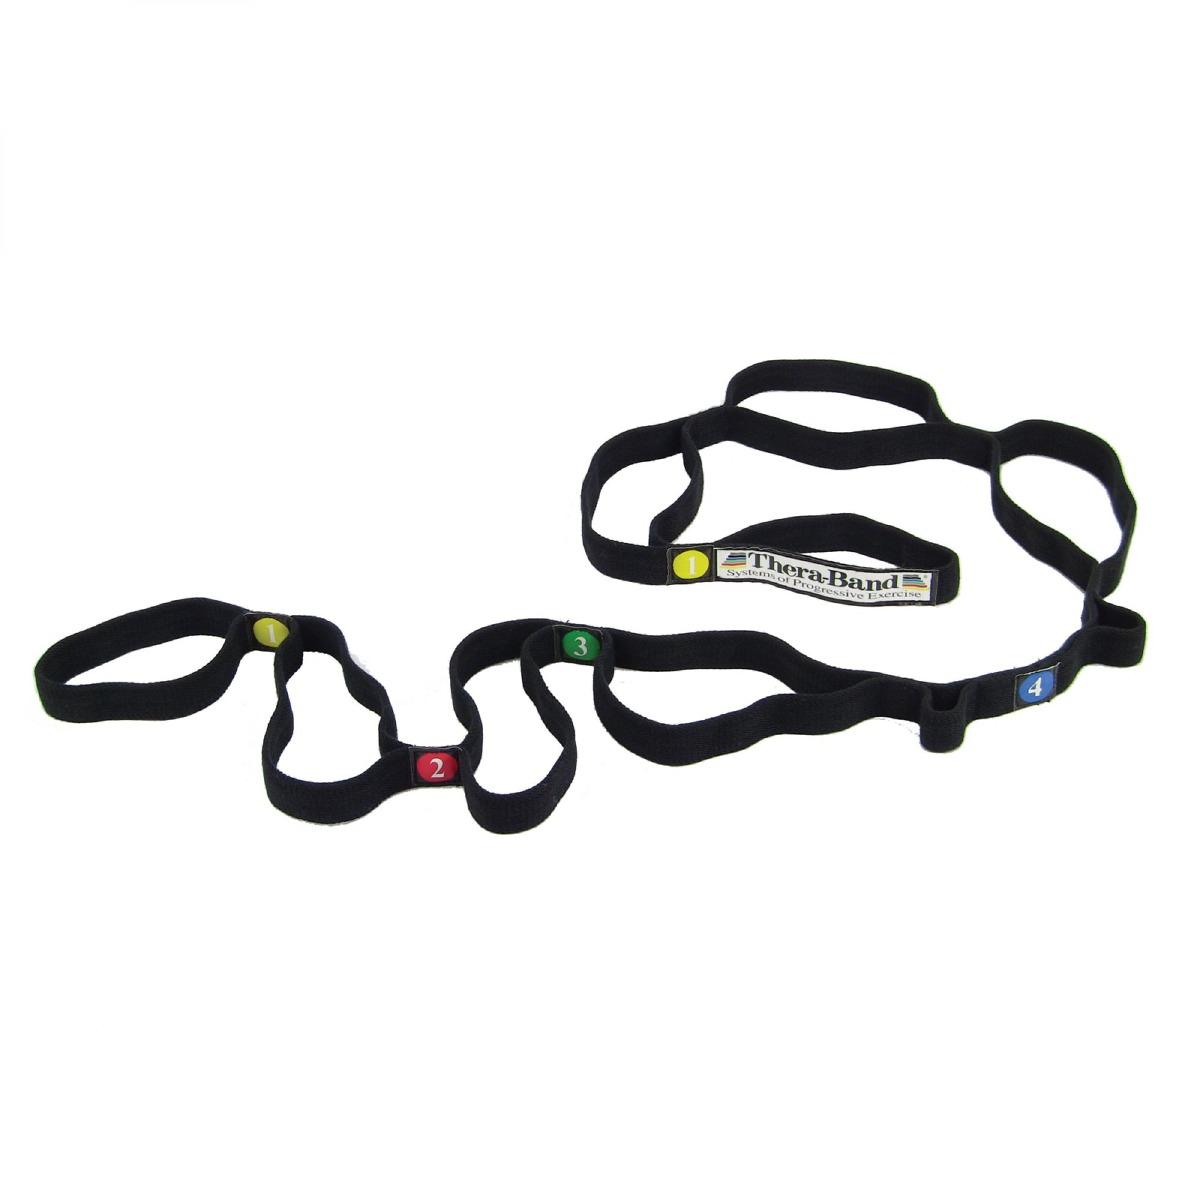 theraband straps